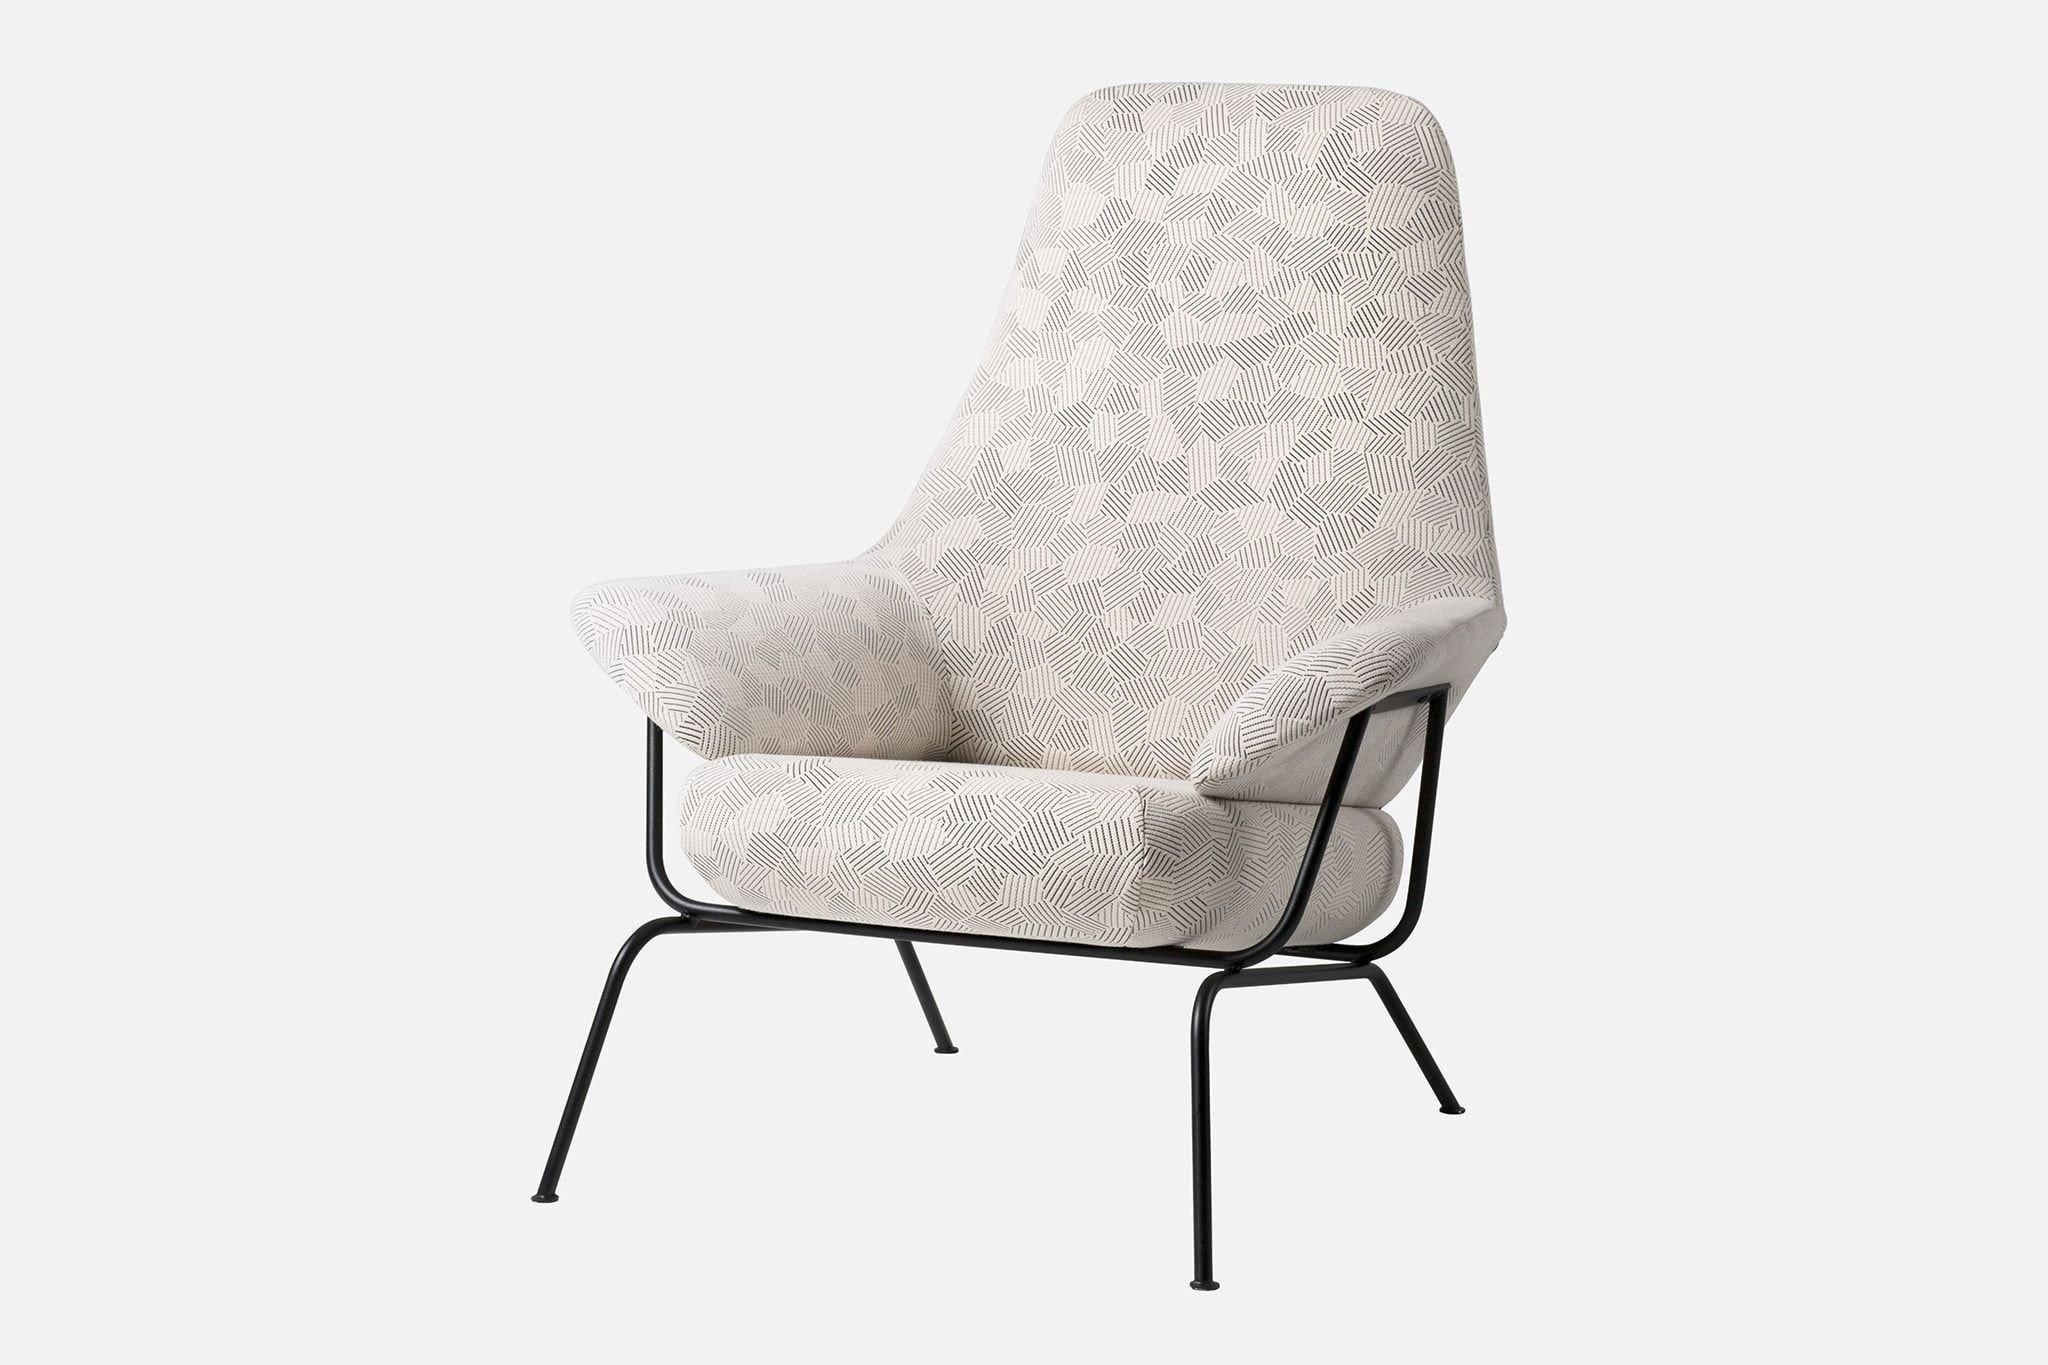 Revista muebles mobiliario de dise o - Studio style sillas ...